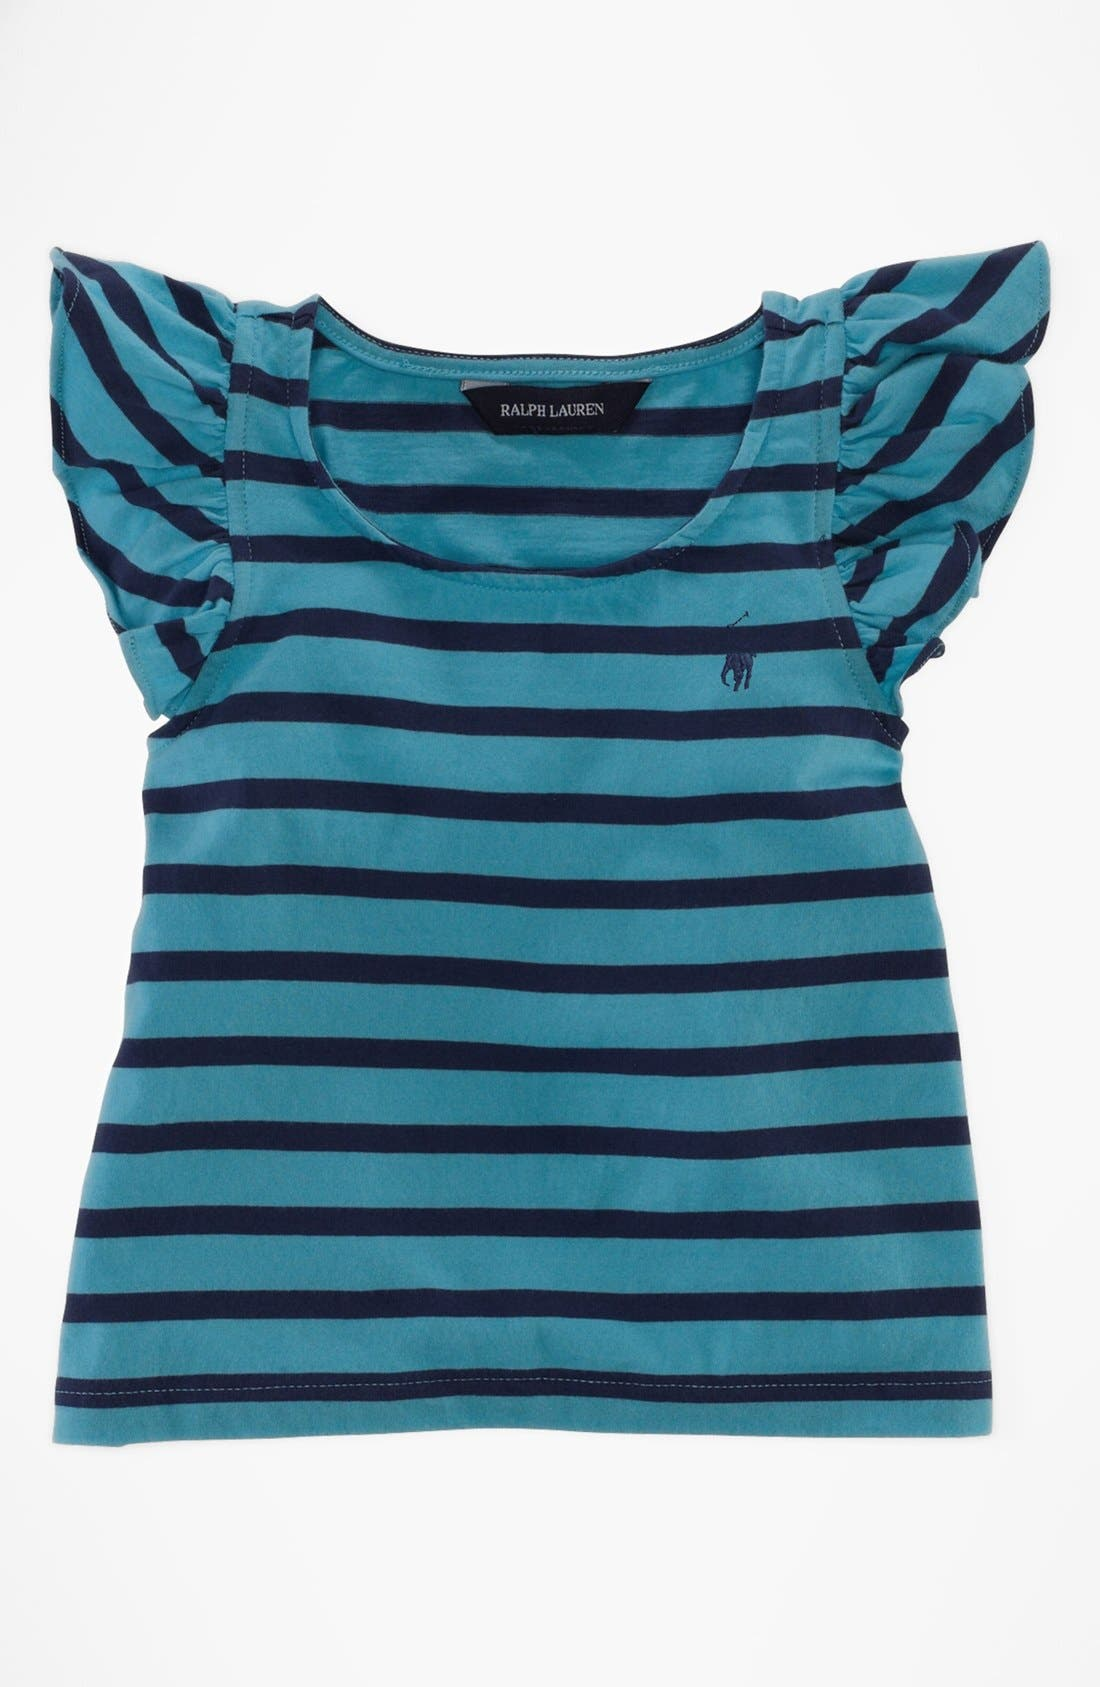 Alternate Image 1 Selected - Ralph Lauren Flutter Sleeve Top (Toddler Girls)